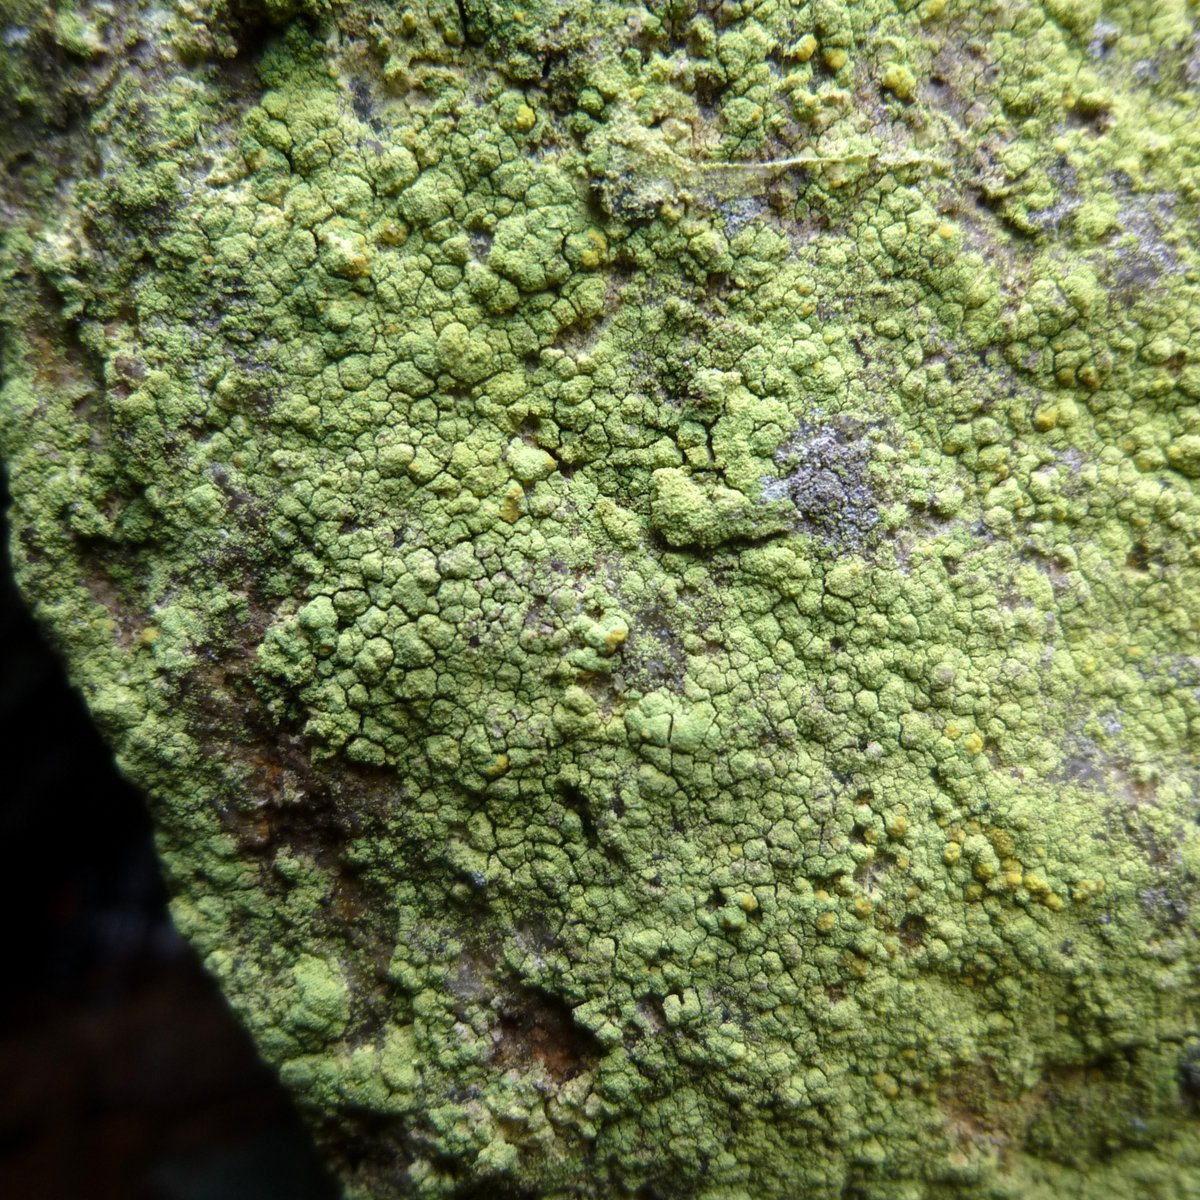 6. Common Goldspeck Lichen